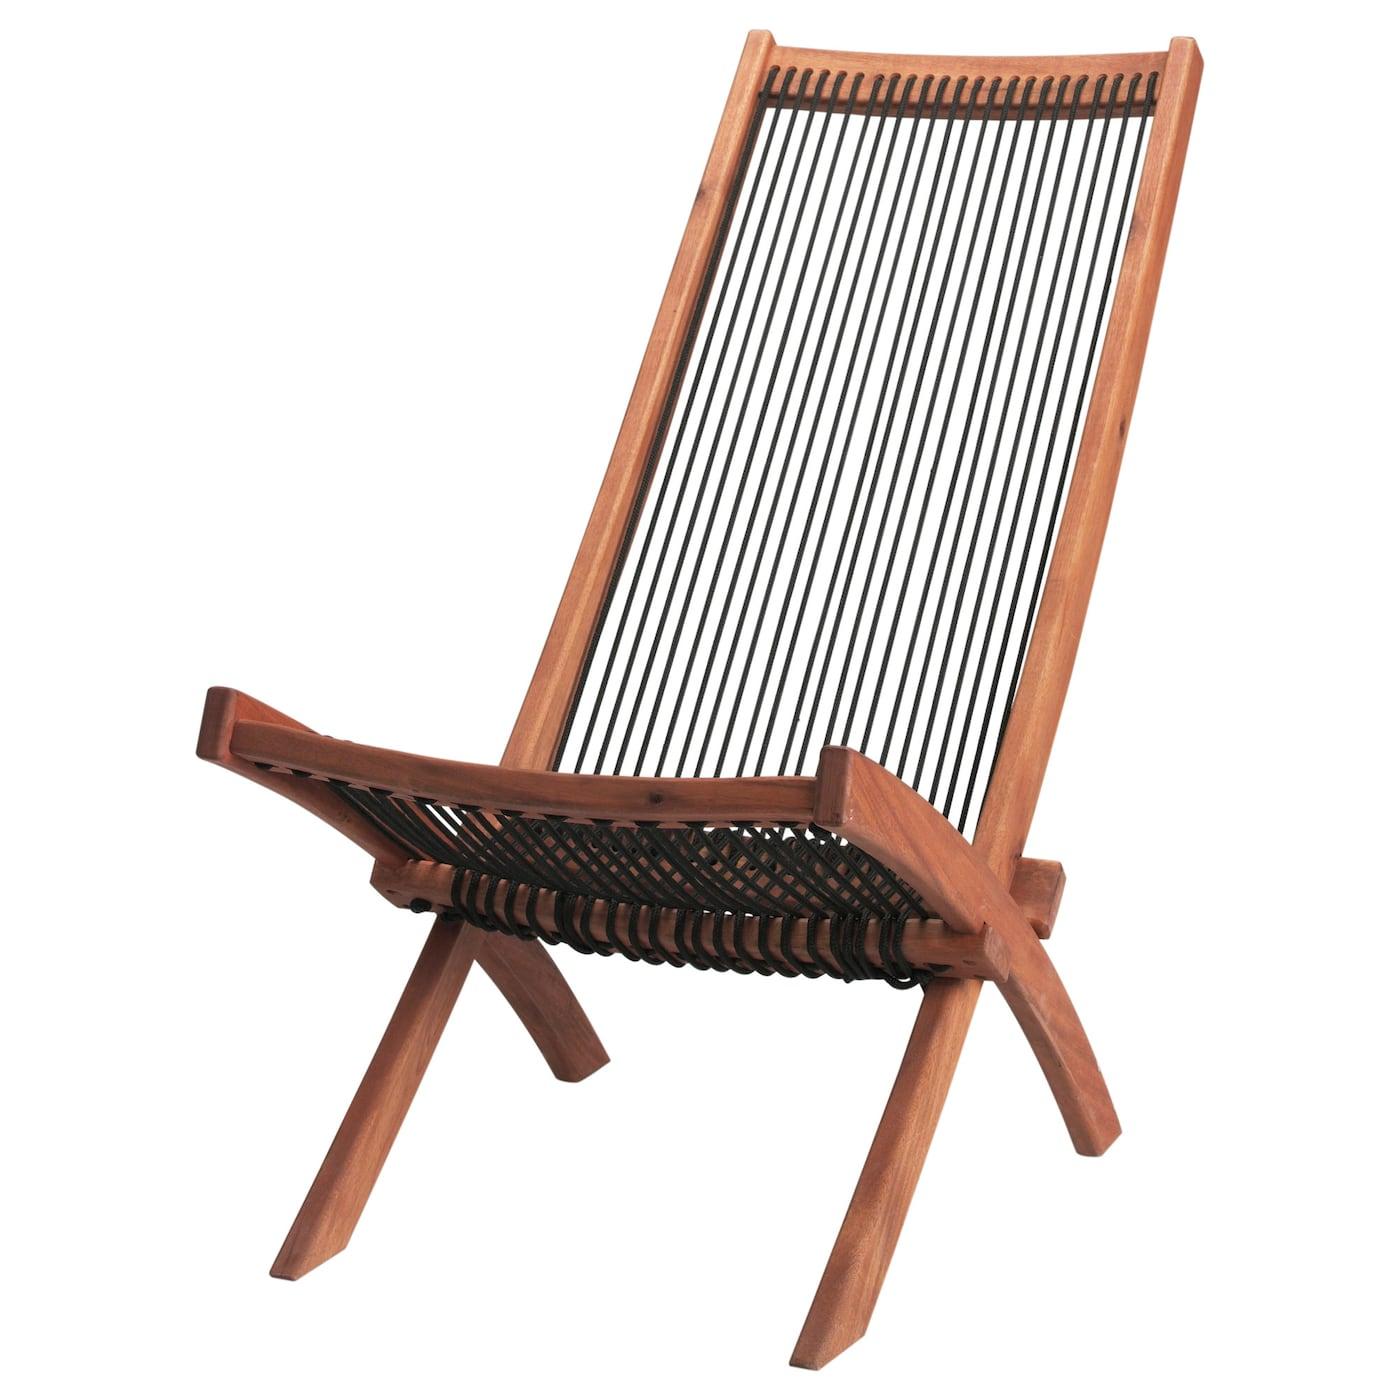 chaise de jardin chaise pliante ikea. Black Bedroom Furniture Sets. Home Design Ideas